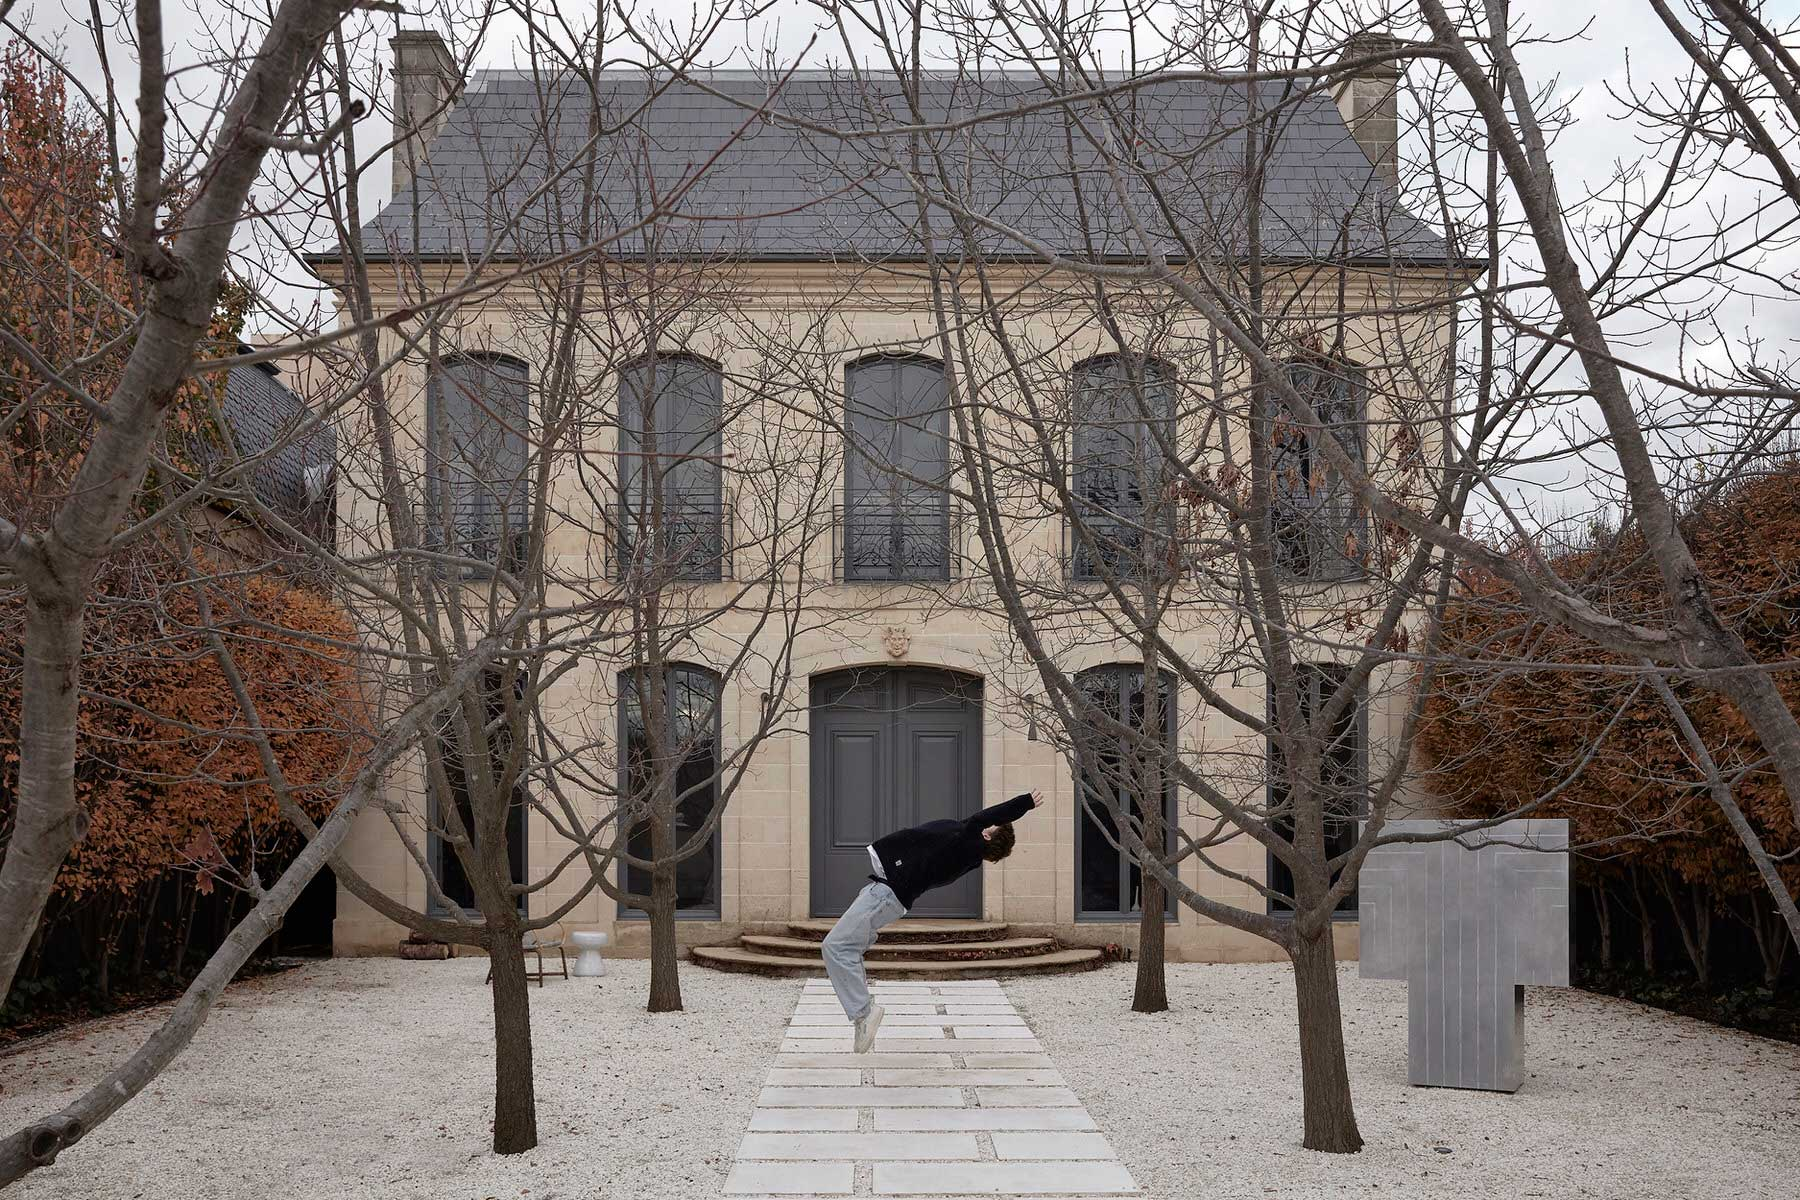 Ottawa Road House in Toorak by Fiona Lynch.